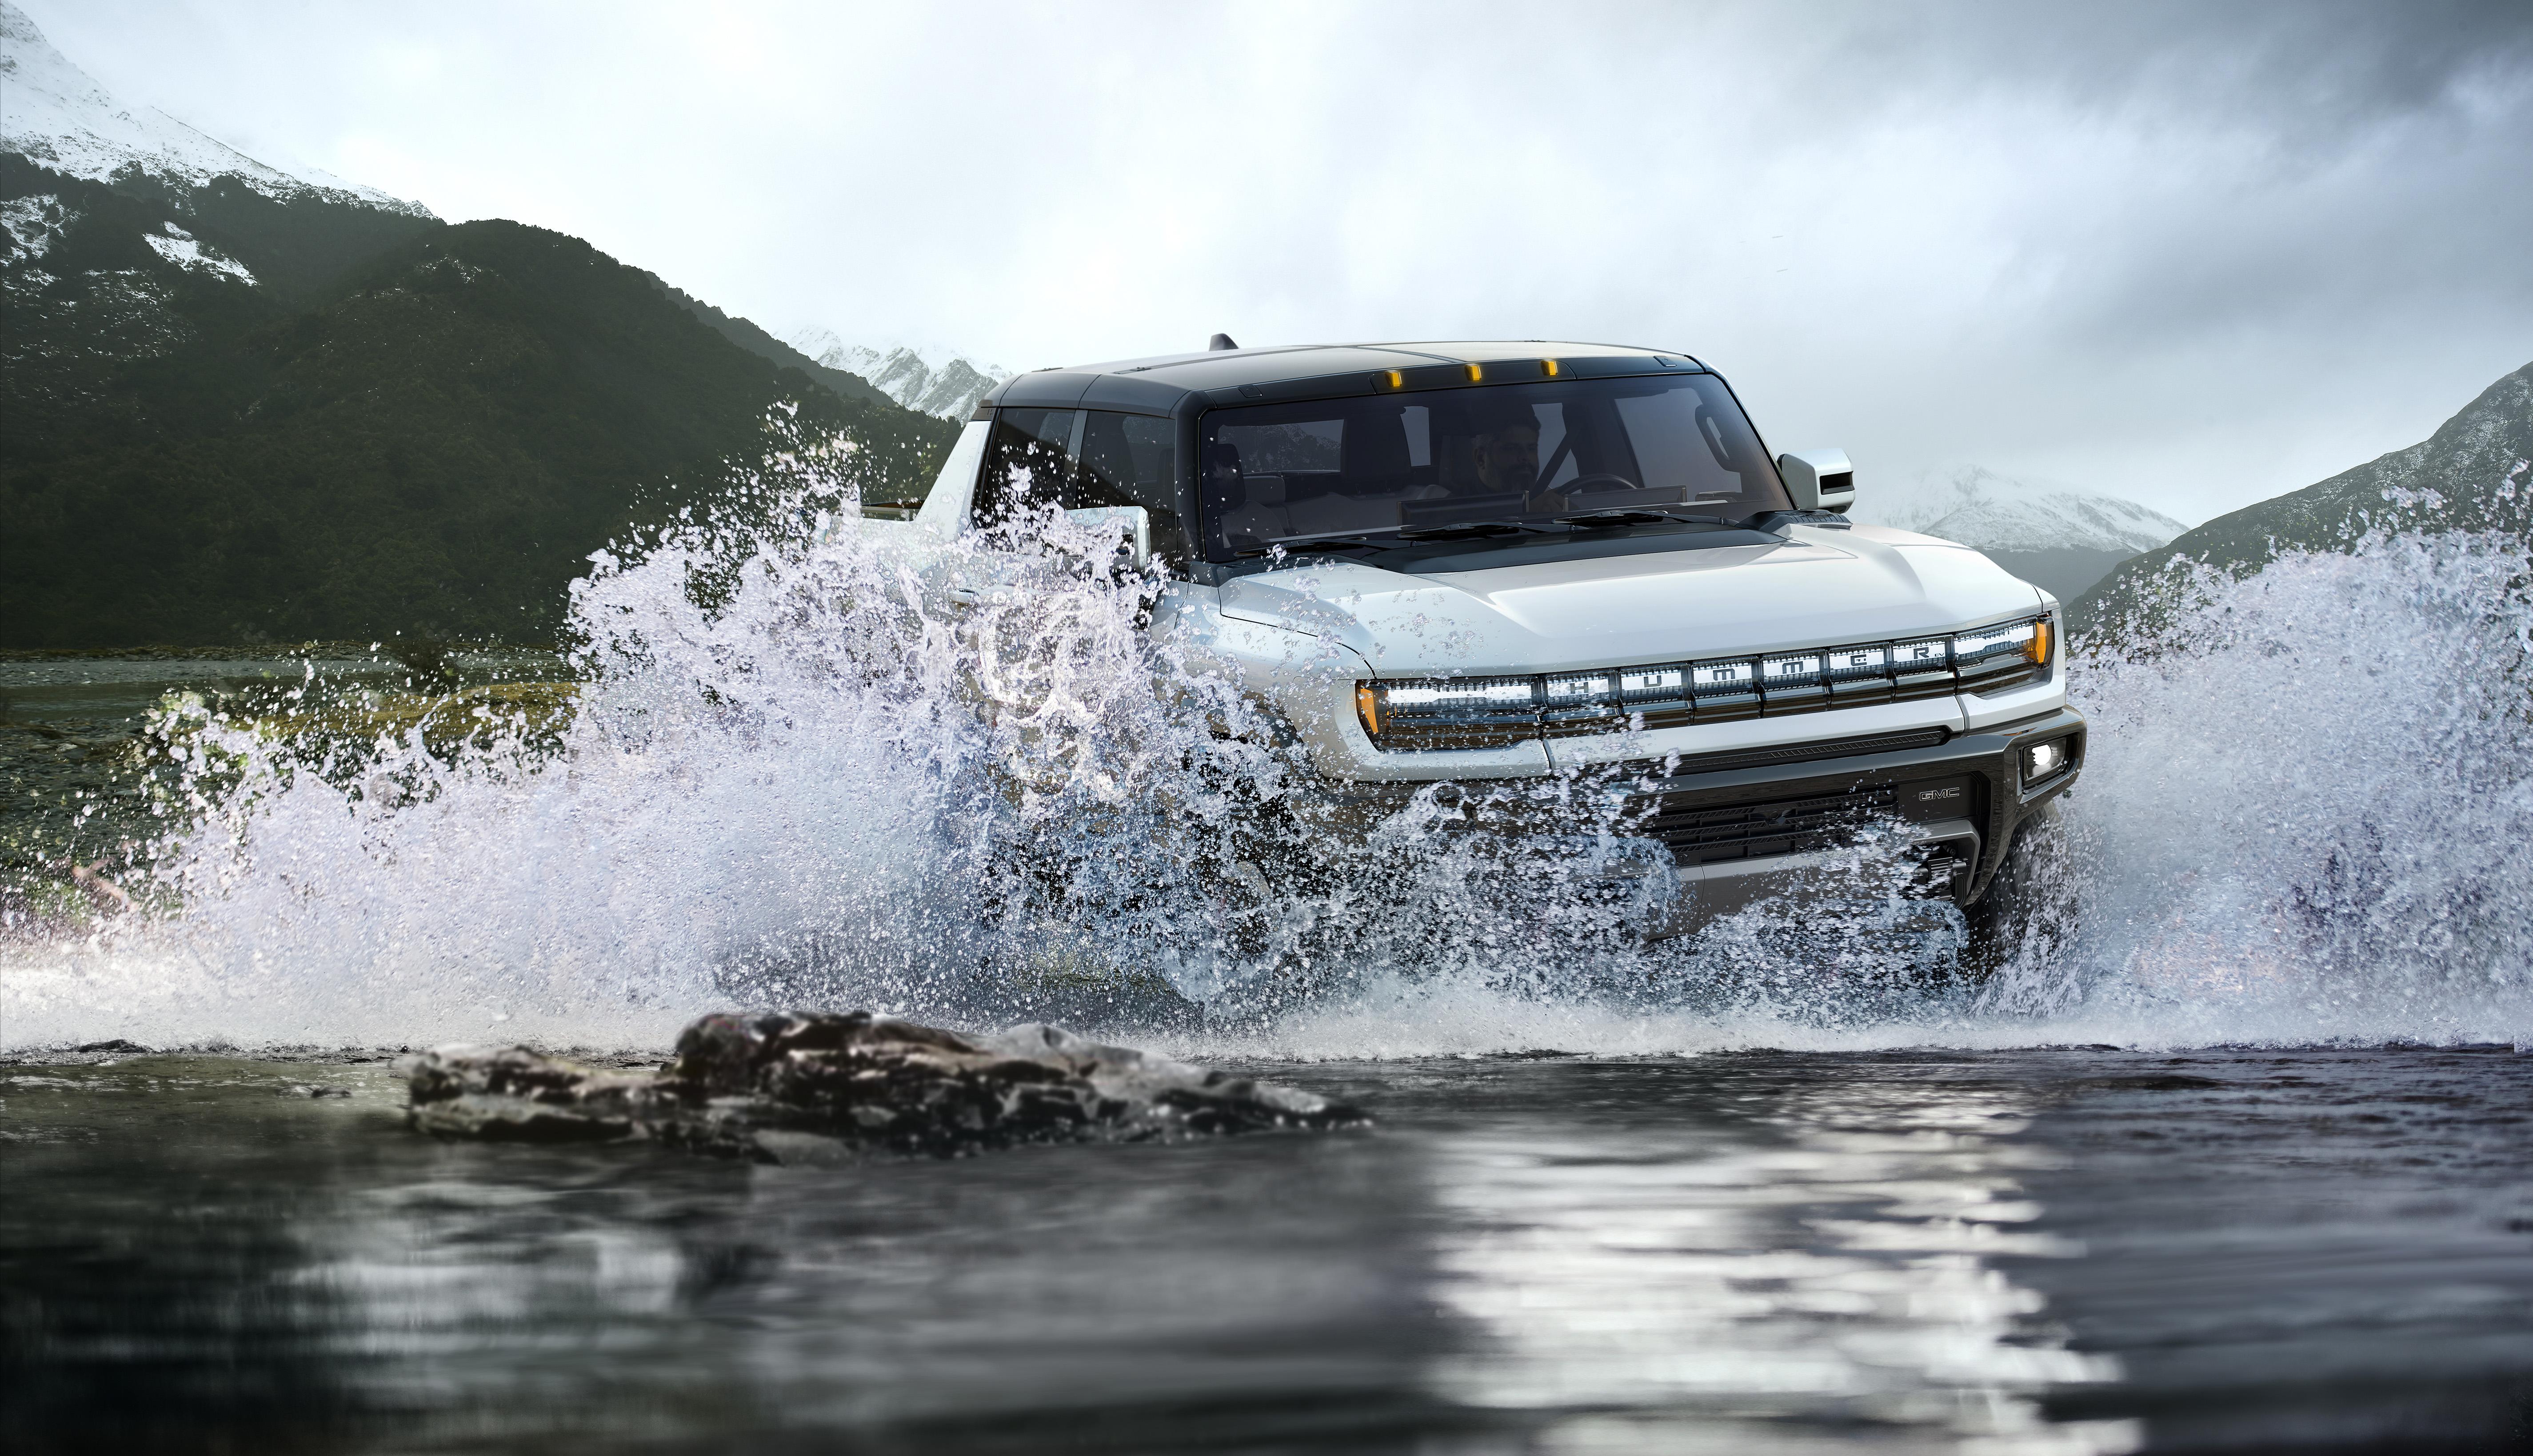 2022 Gmc Hummer Ev Edition 1 Off Road Beast